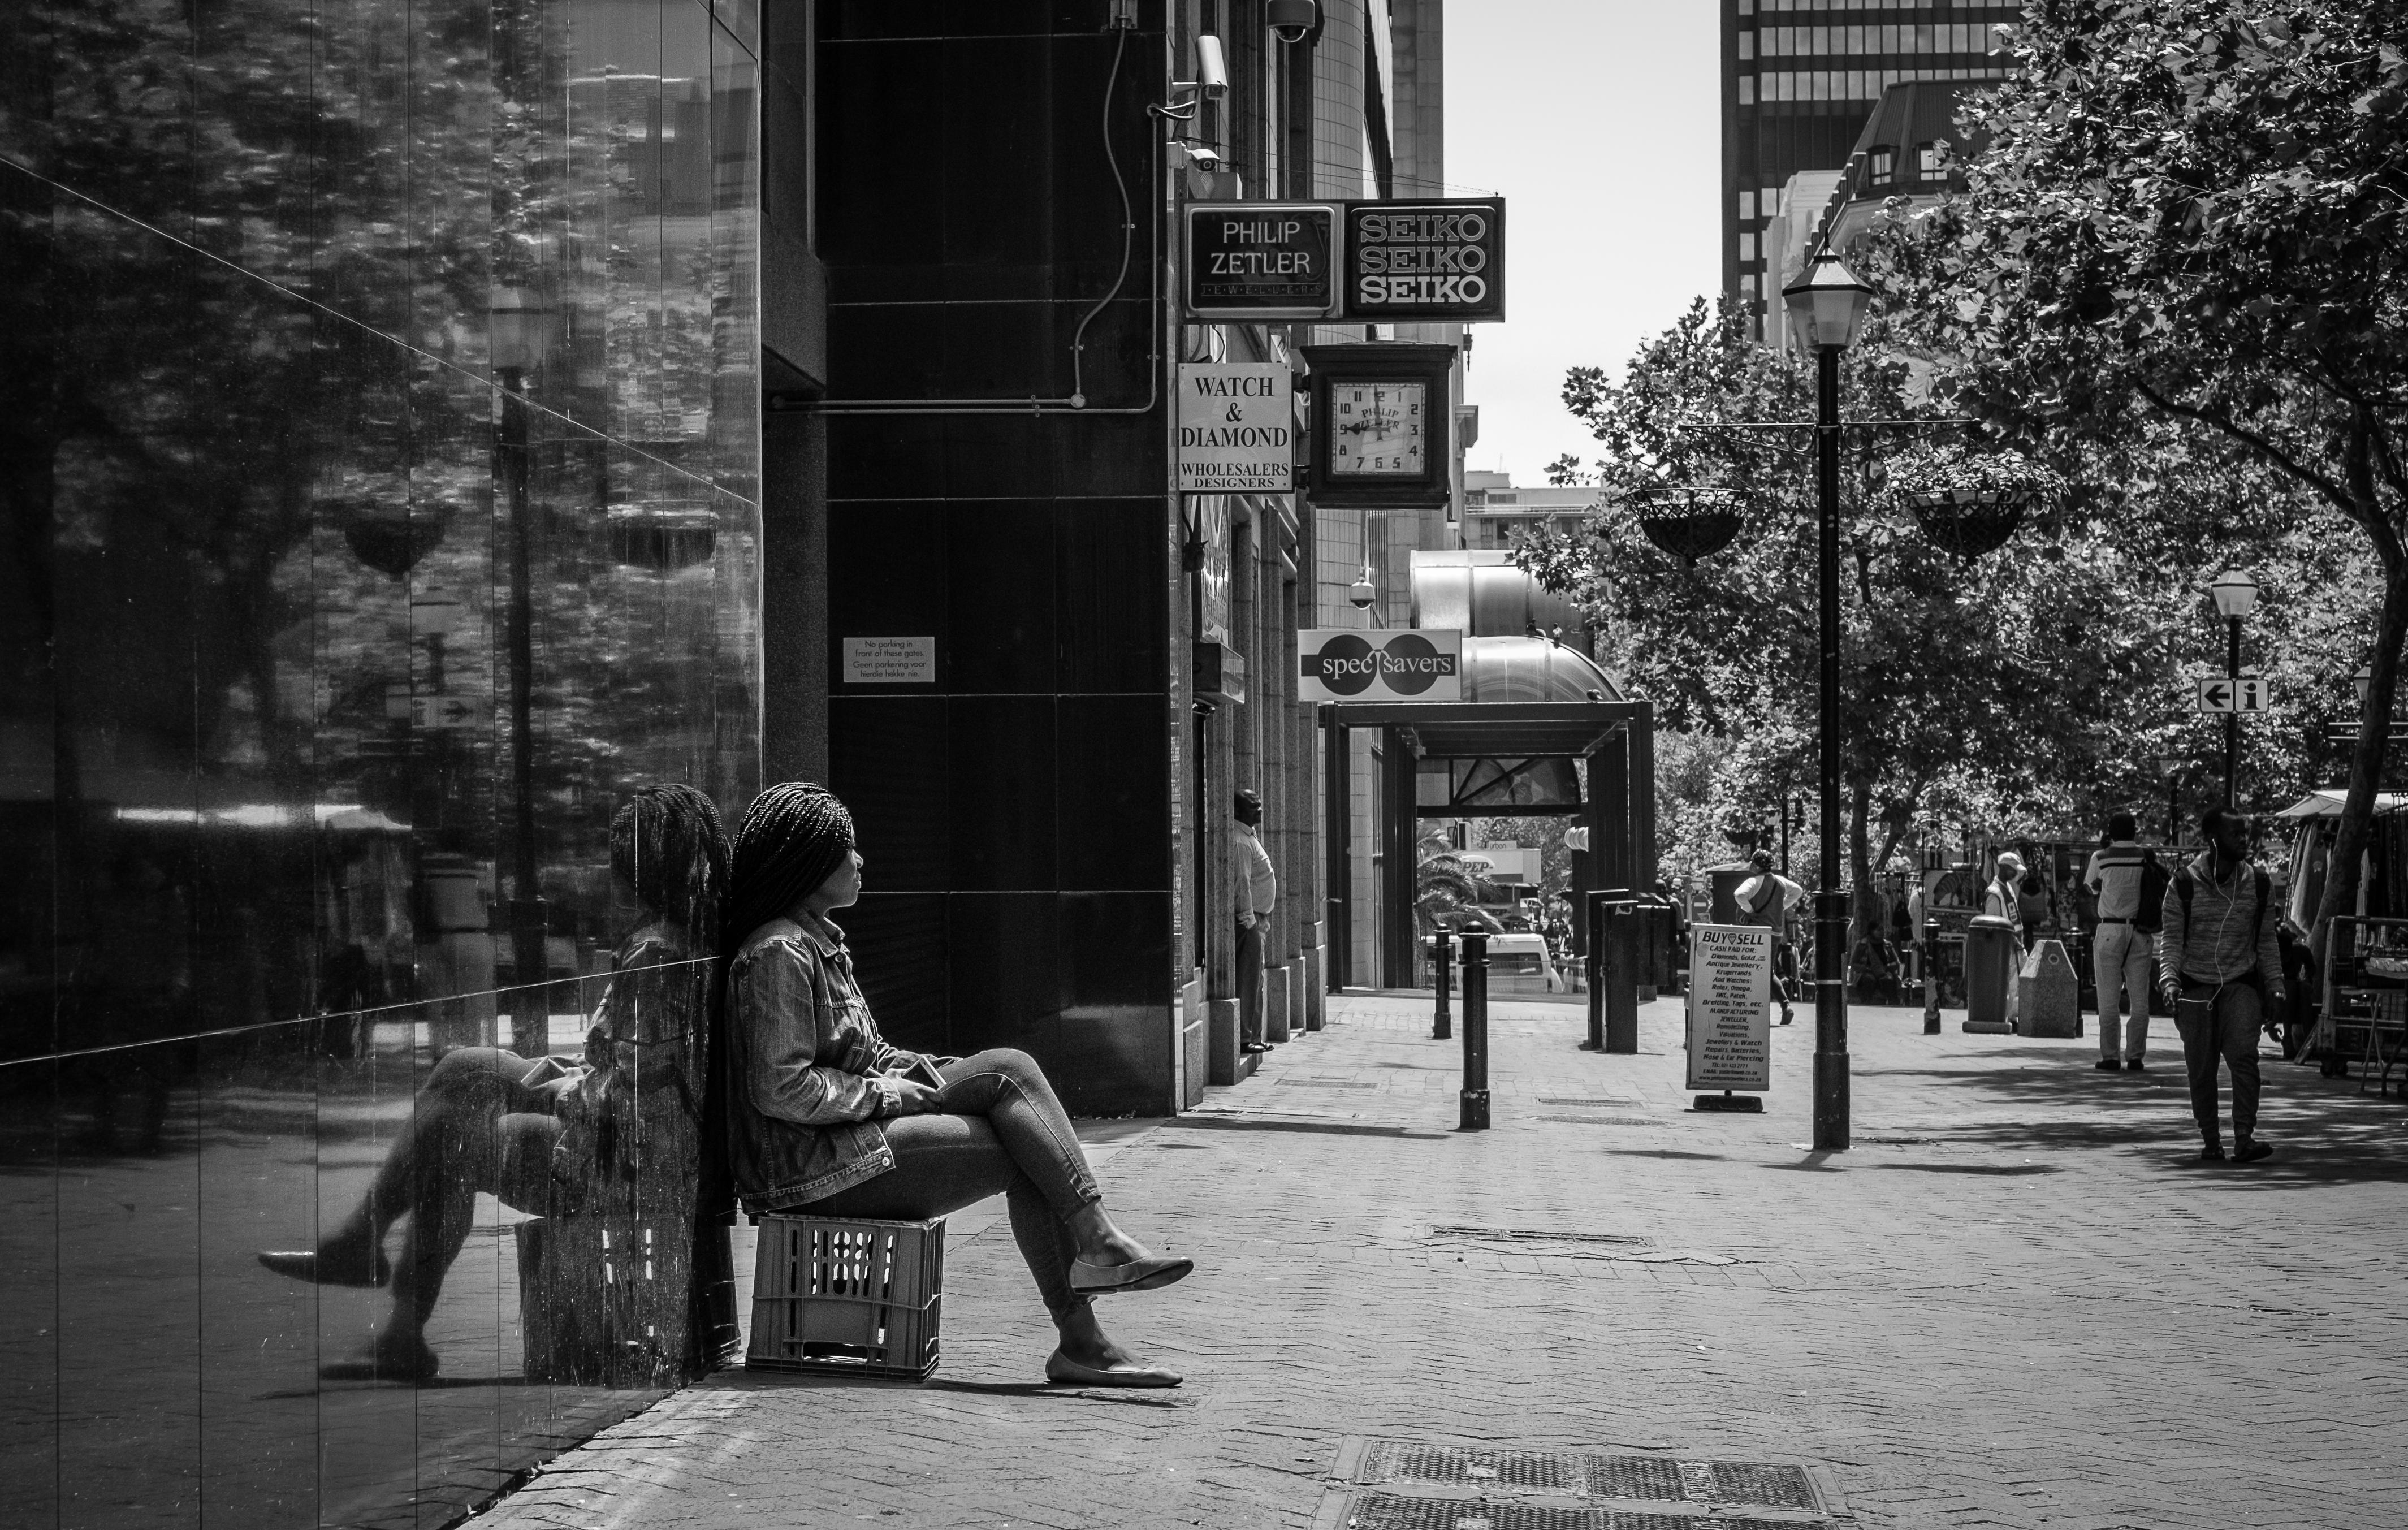 Black and white outdoor girl portrait - 54ka [photo blog]